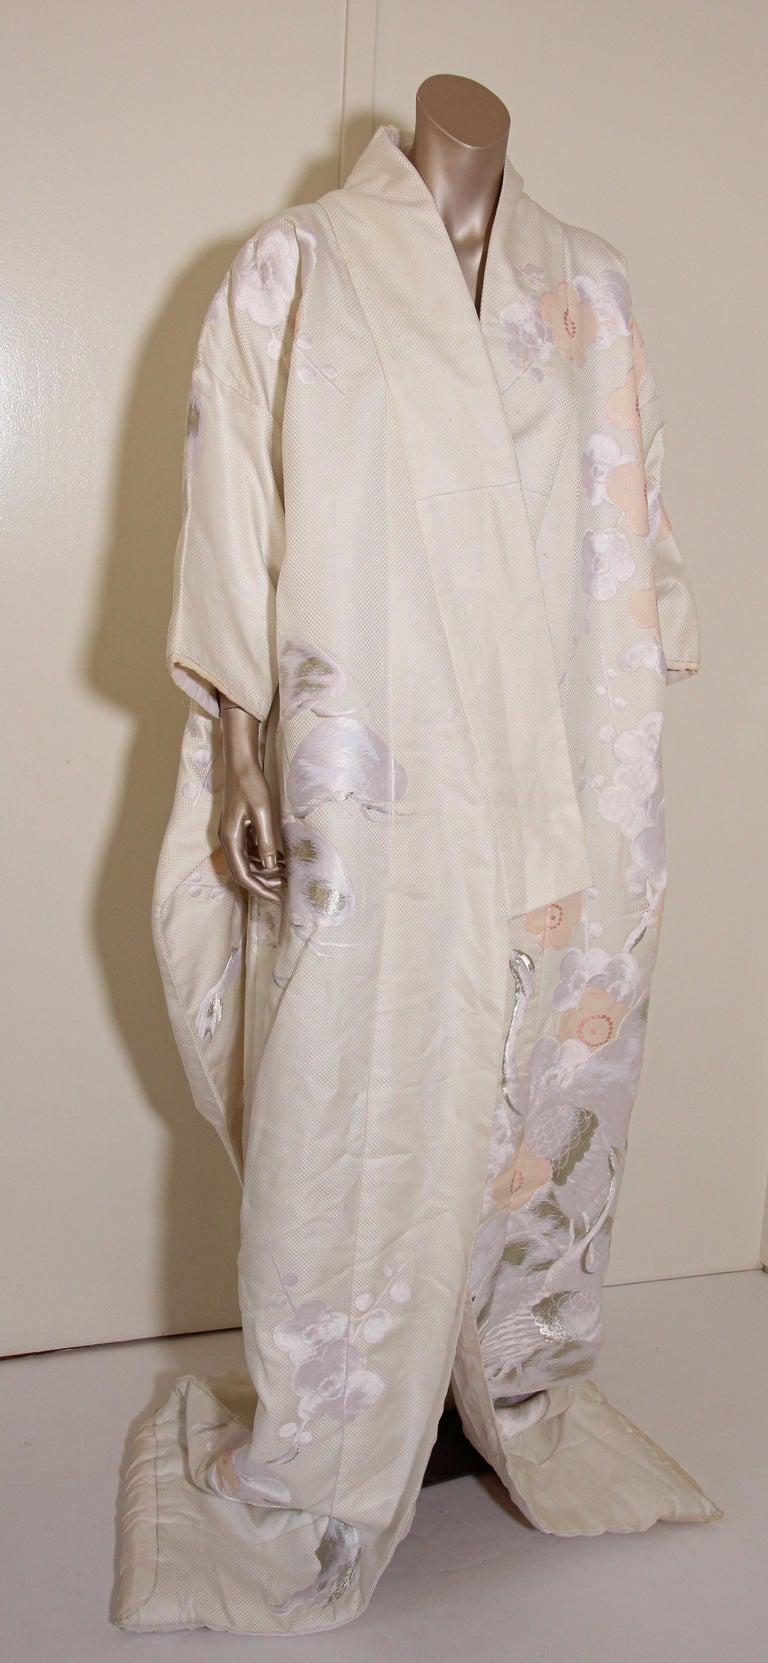 Vintage Collectable Japanese White Silk Ceremonial Wedding Kimono For Sale 14